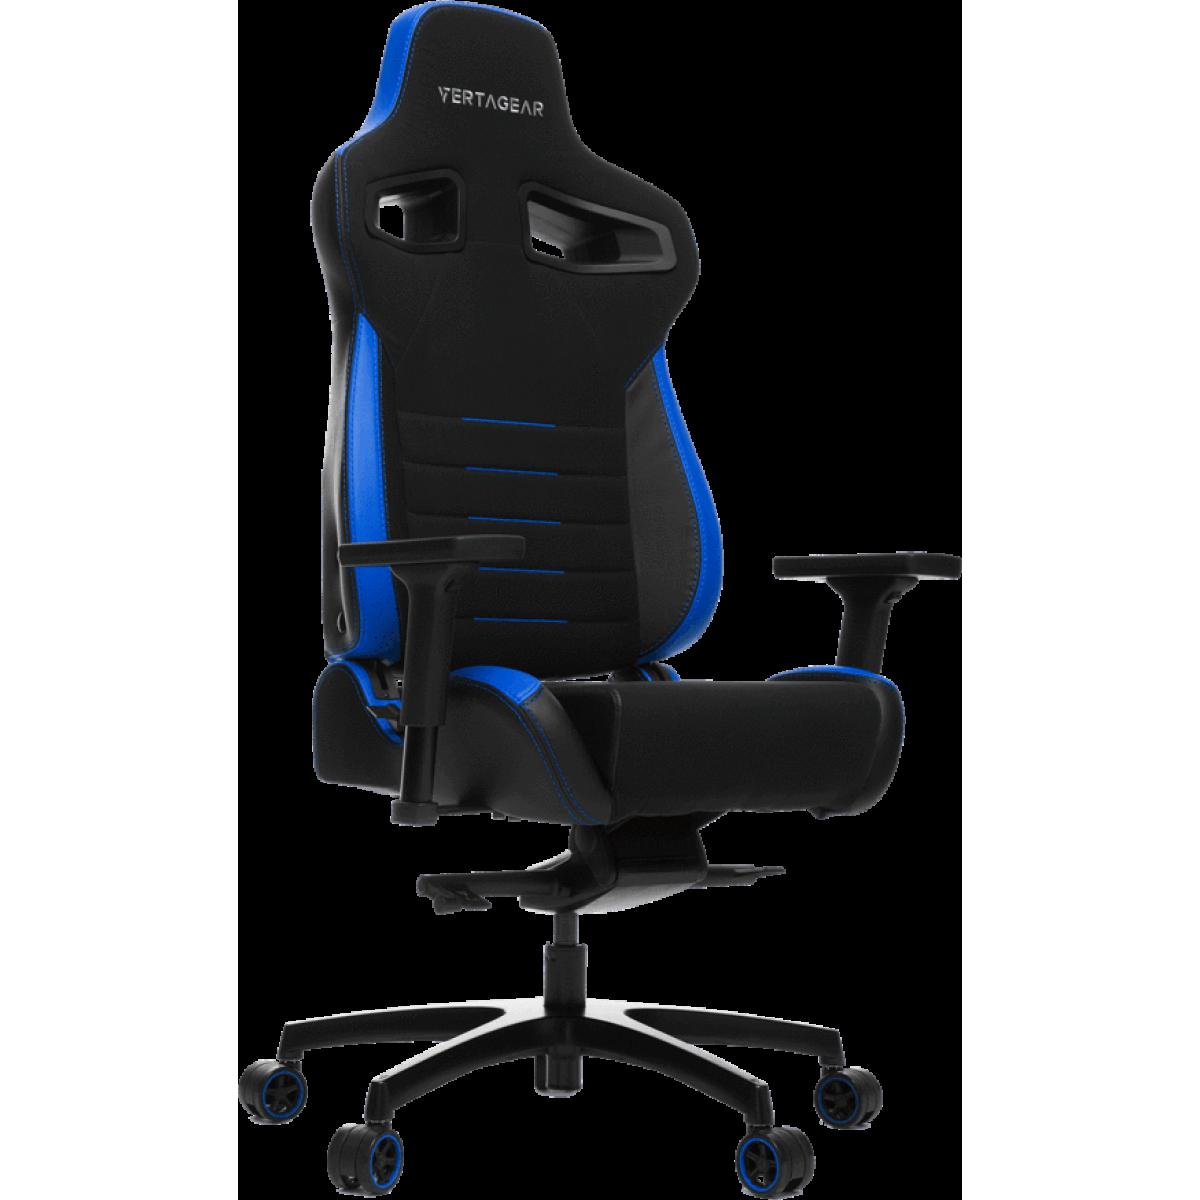 Cadeira Gamer Vertagear Racing PL4500, Black-Blue, VG-PL4500_BL